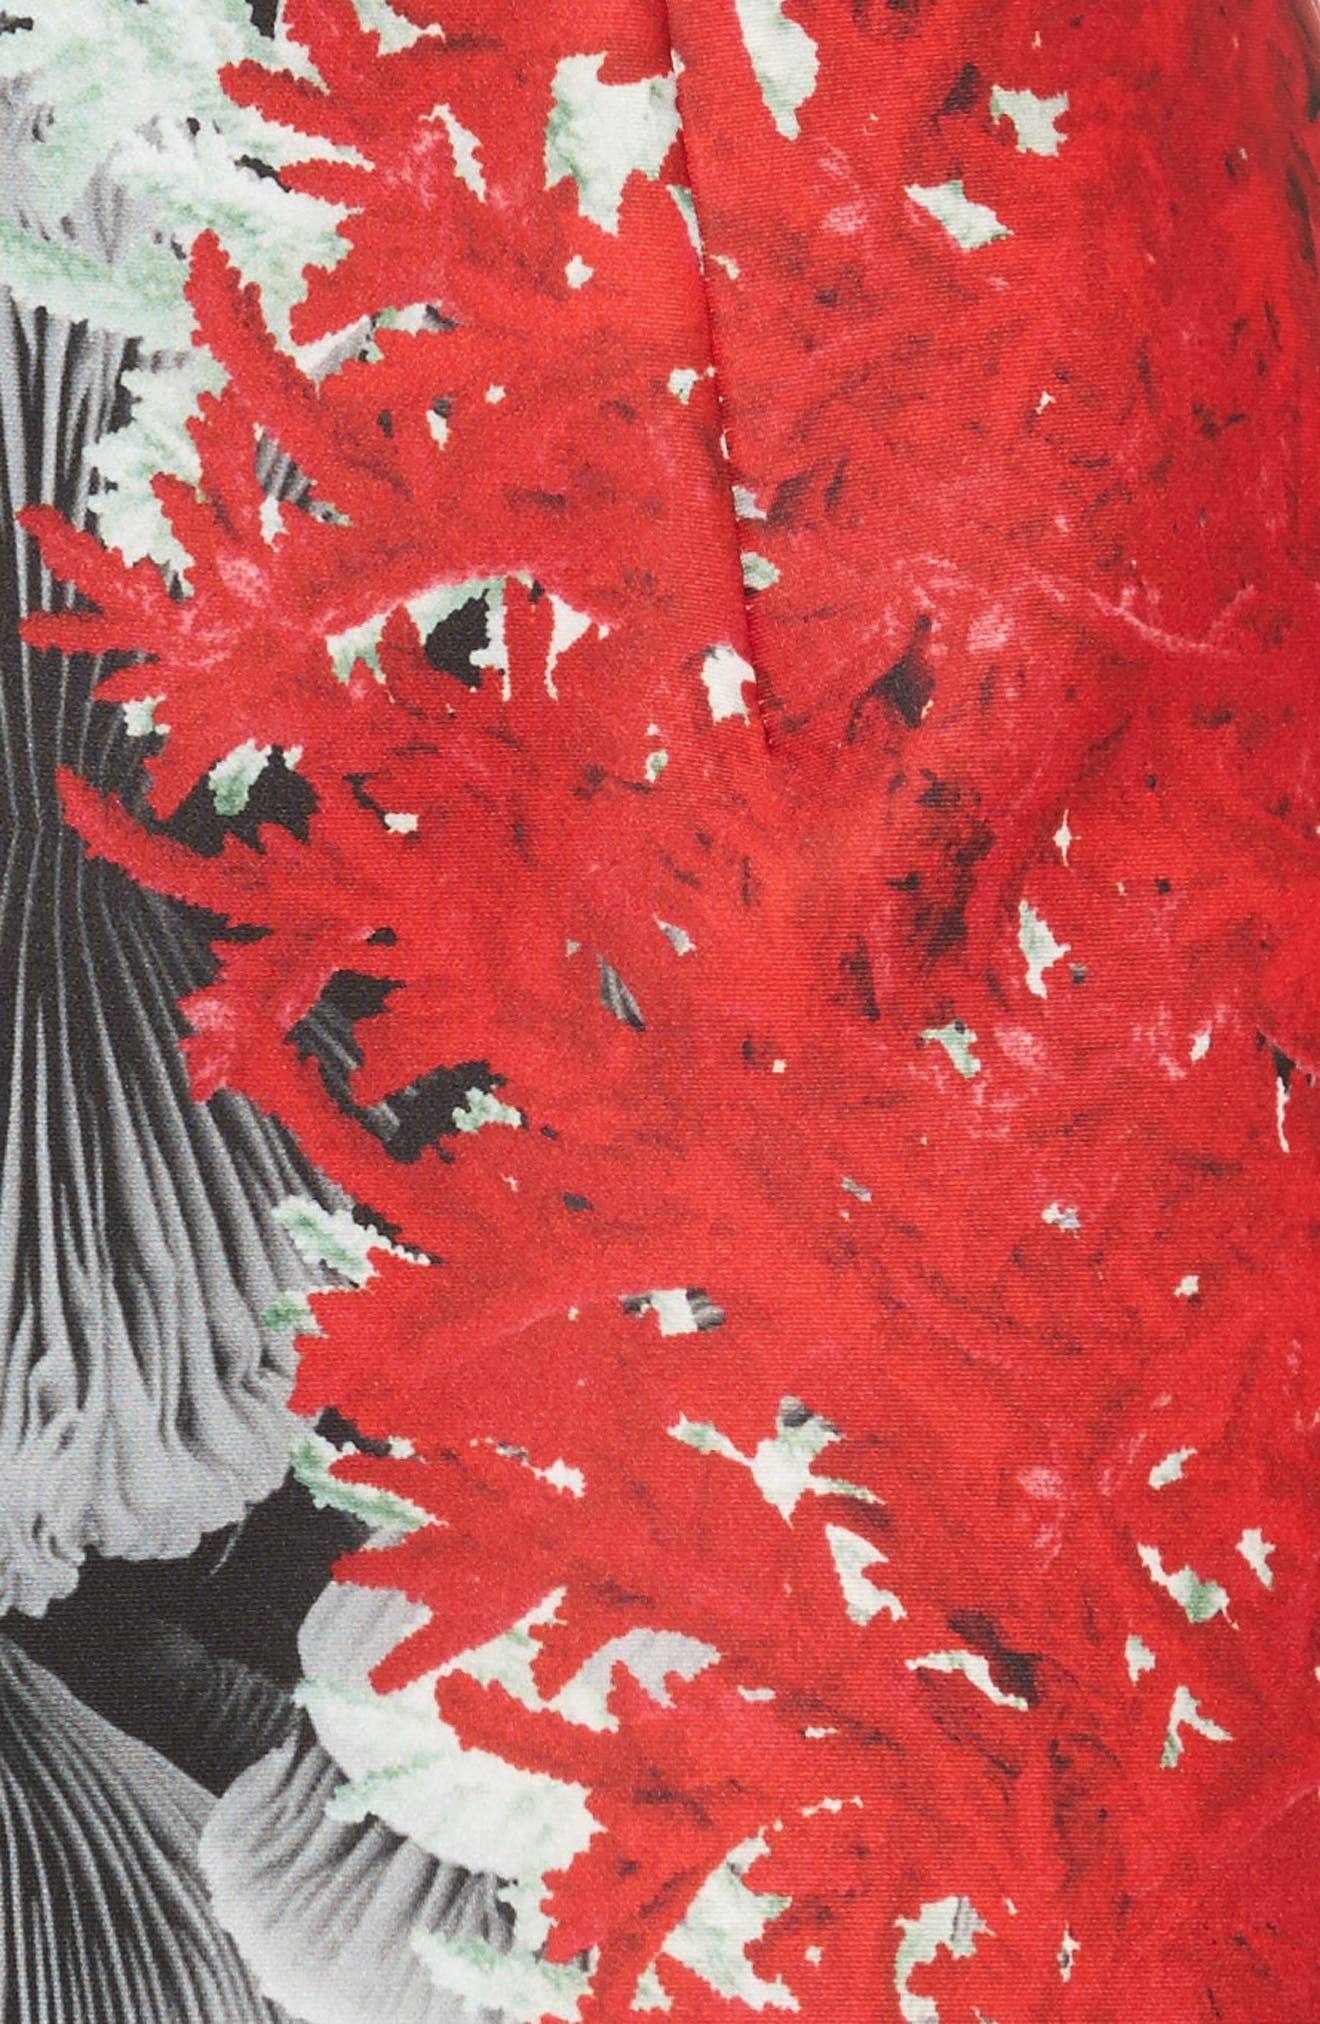 Coral Print Scuba Sheath Dress,                             Alternate thumbnail 5, color,                             020